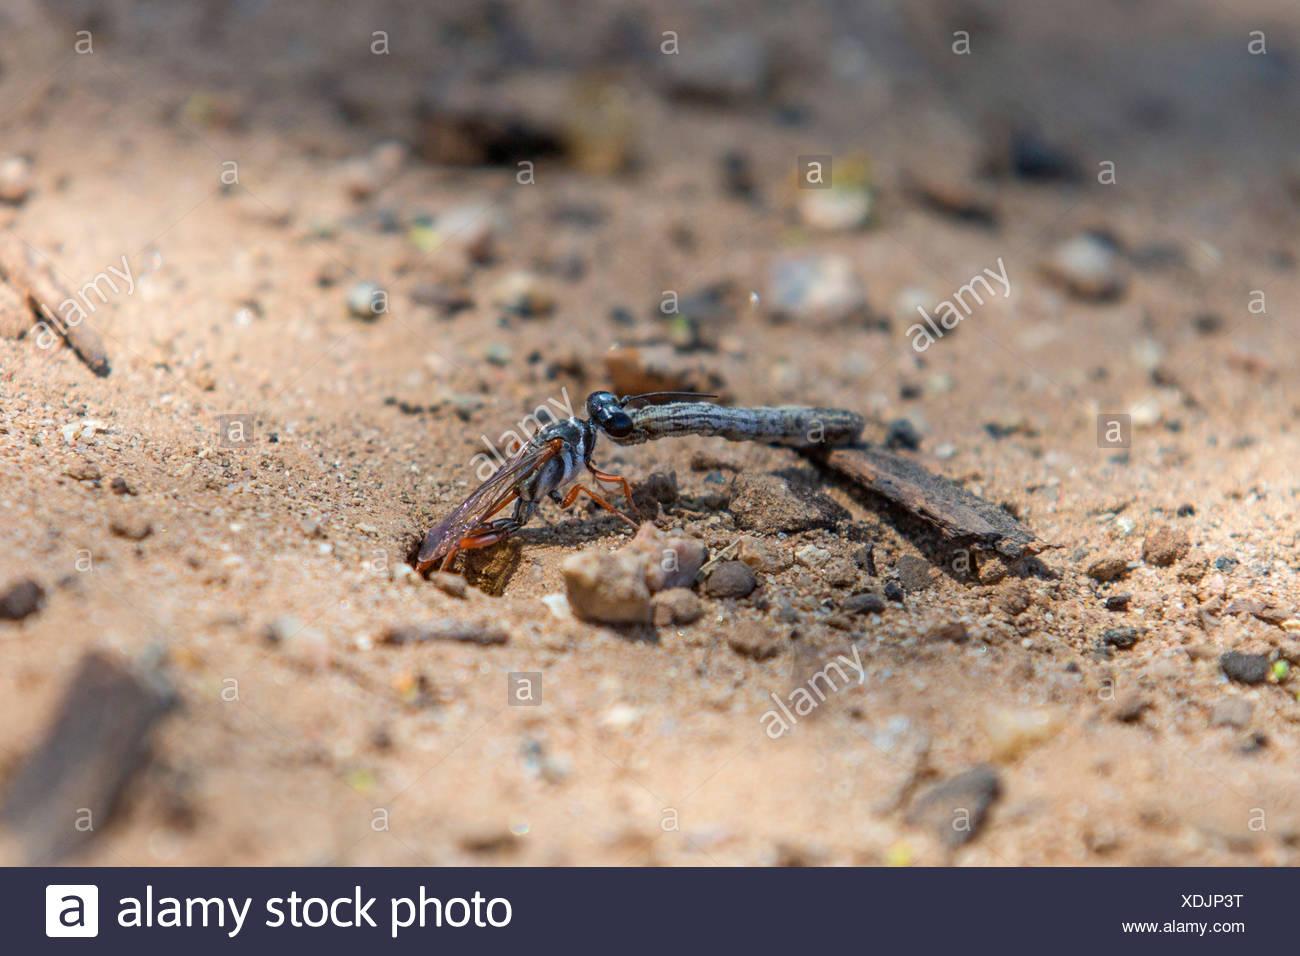 digger wasps, hunting wasps (Sphecidae, Sphegidae), pulling a caterpillar in a prey hiding-place, USA, Arizona, Phoenix Stock Photo